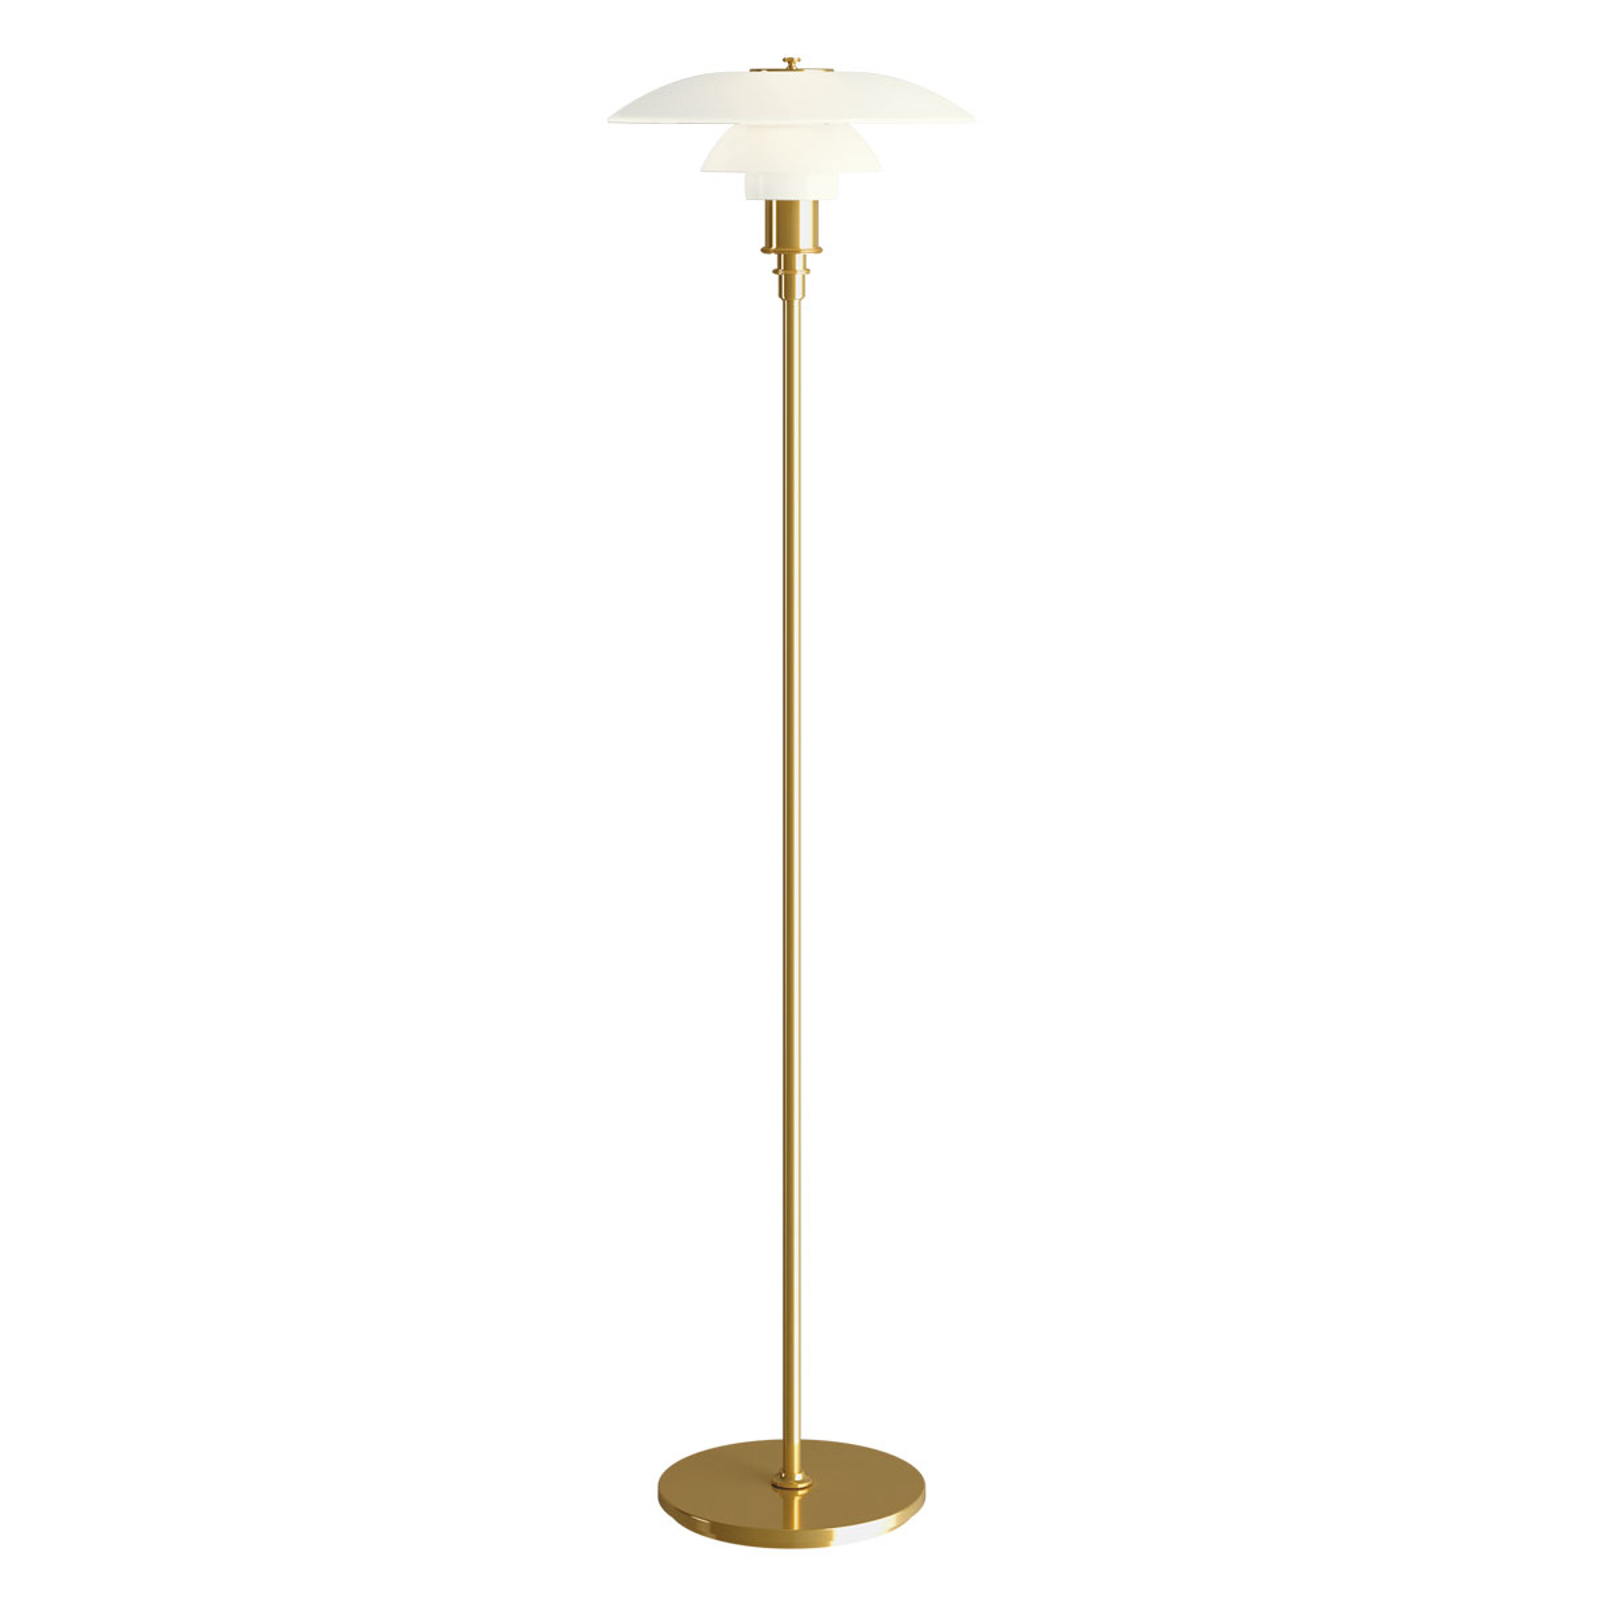 Louis Poulsen PH 3 1/2-2 1/2 lampadaire laiton